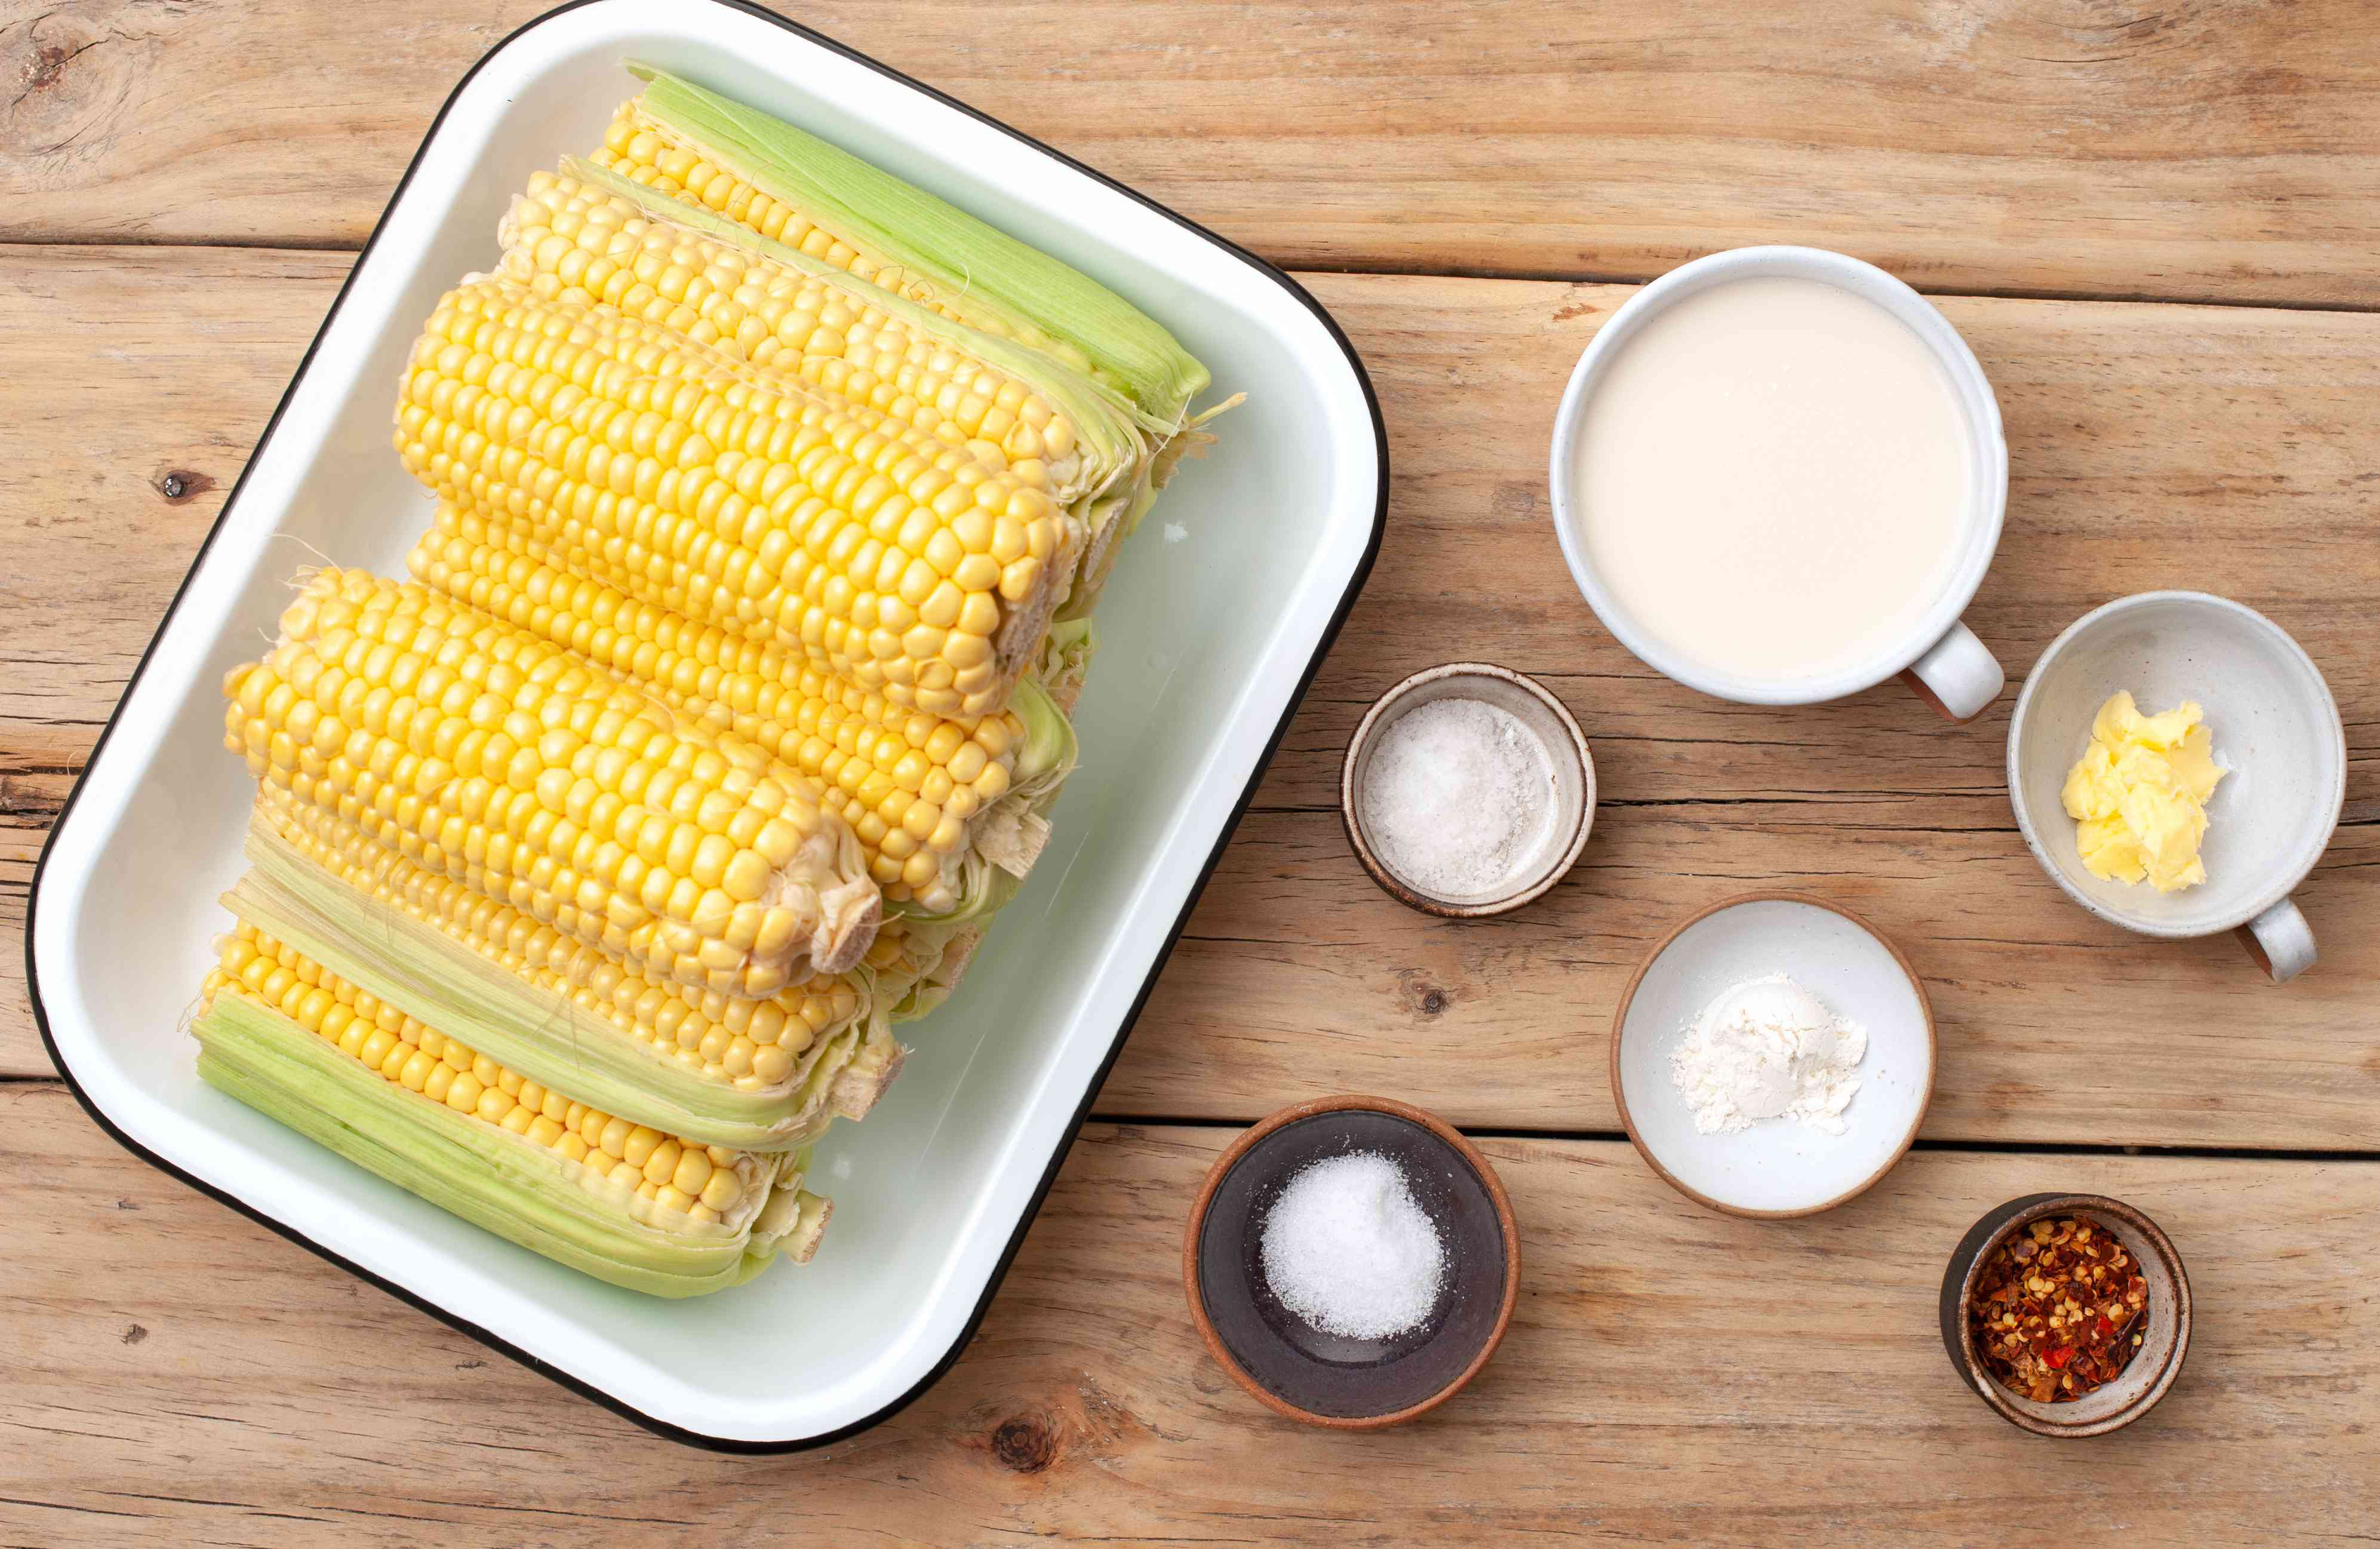 Ingredients for vegan creamed corn